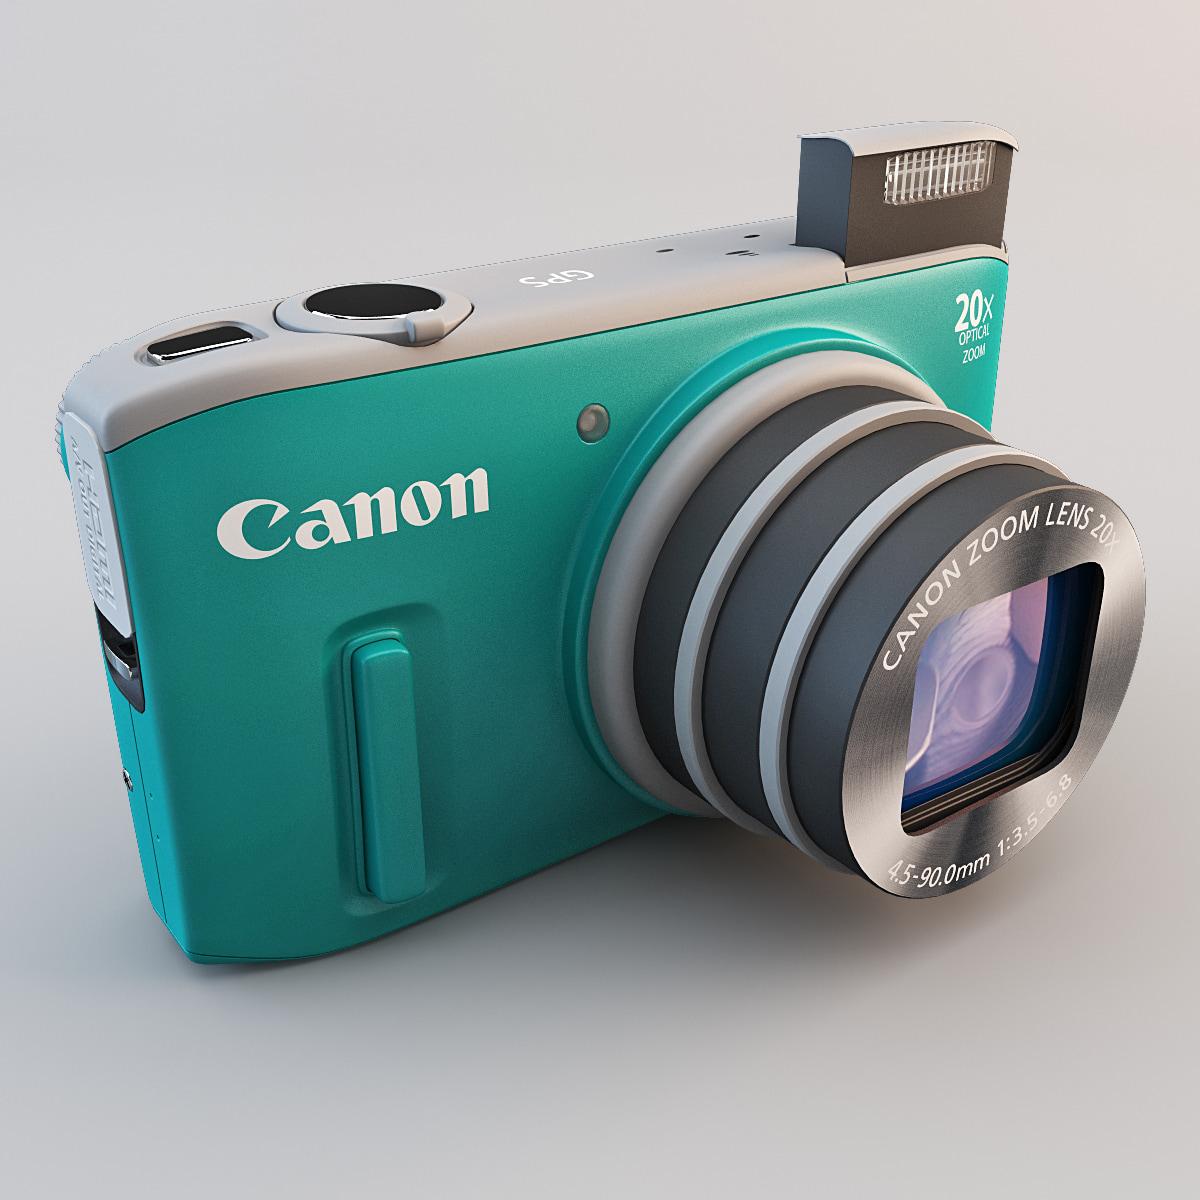 125674_Canon_PowerShot_SX260_HS_0001.jpg